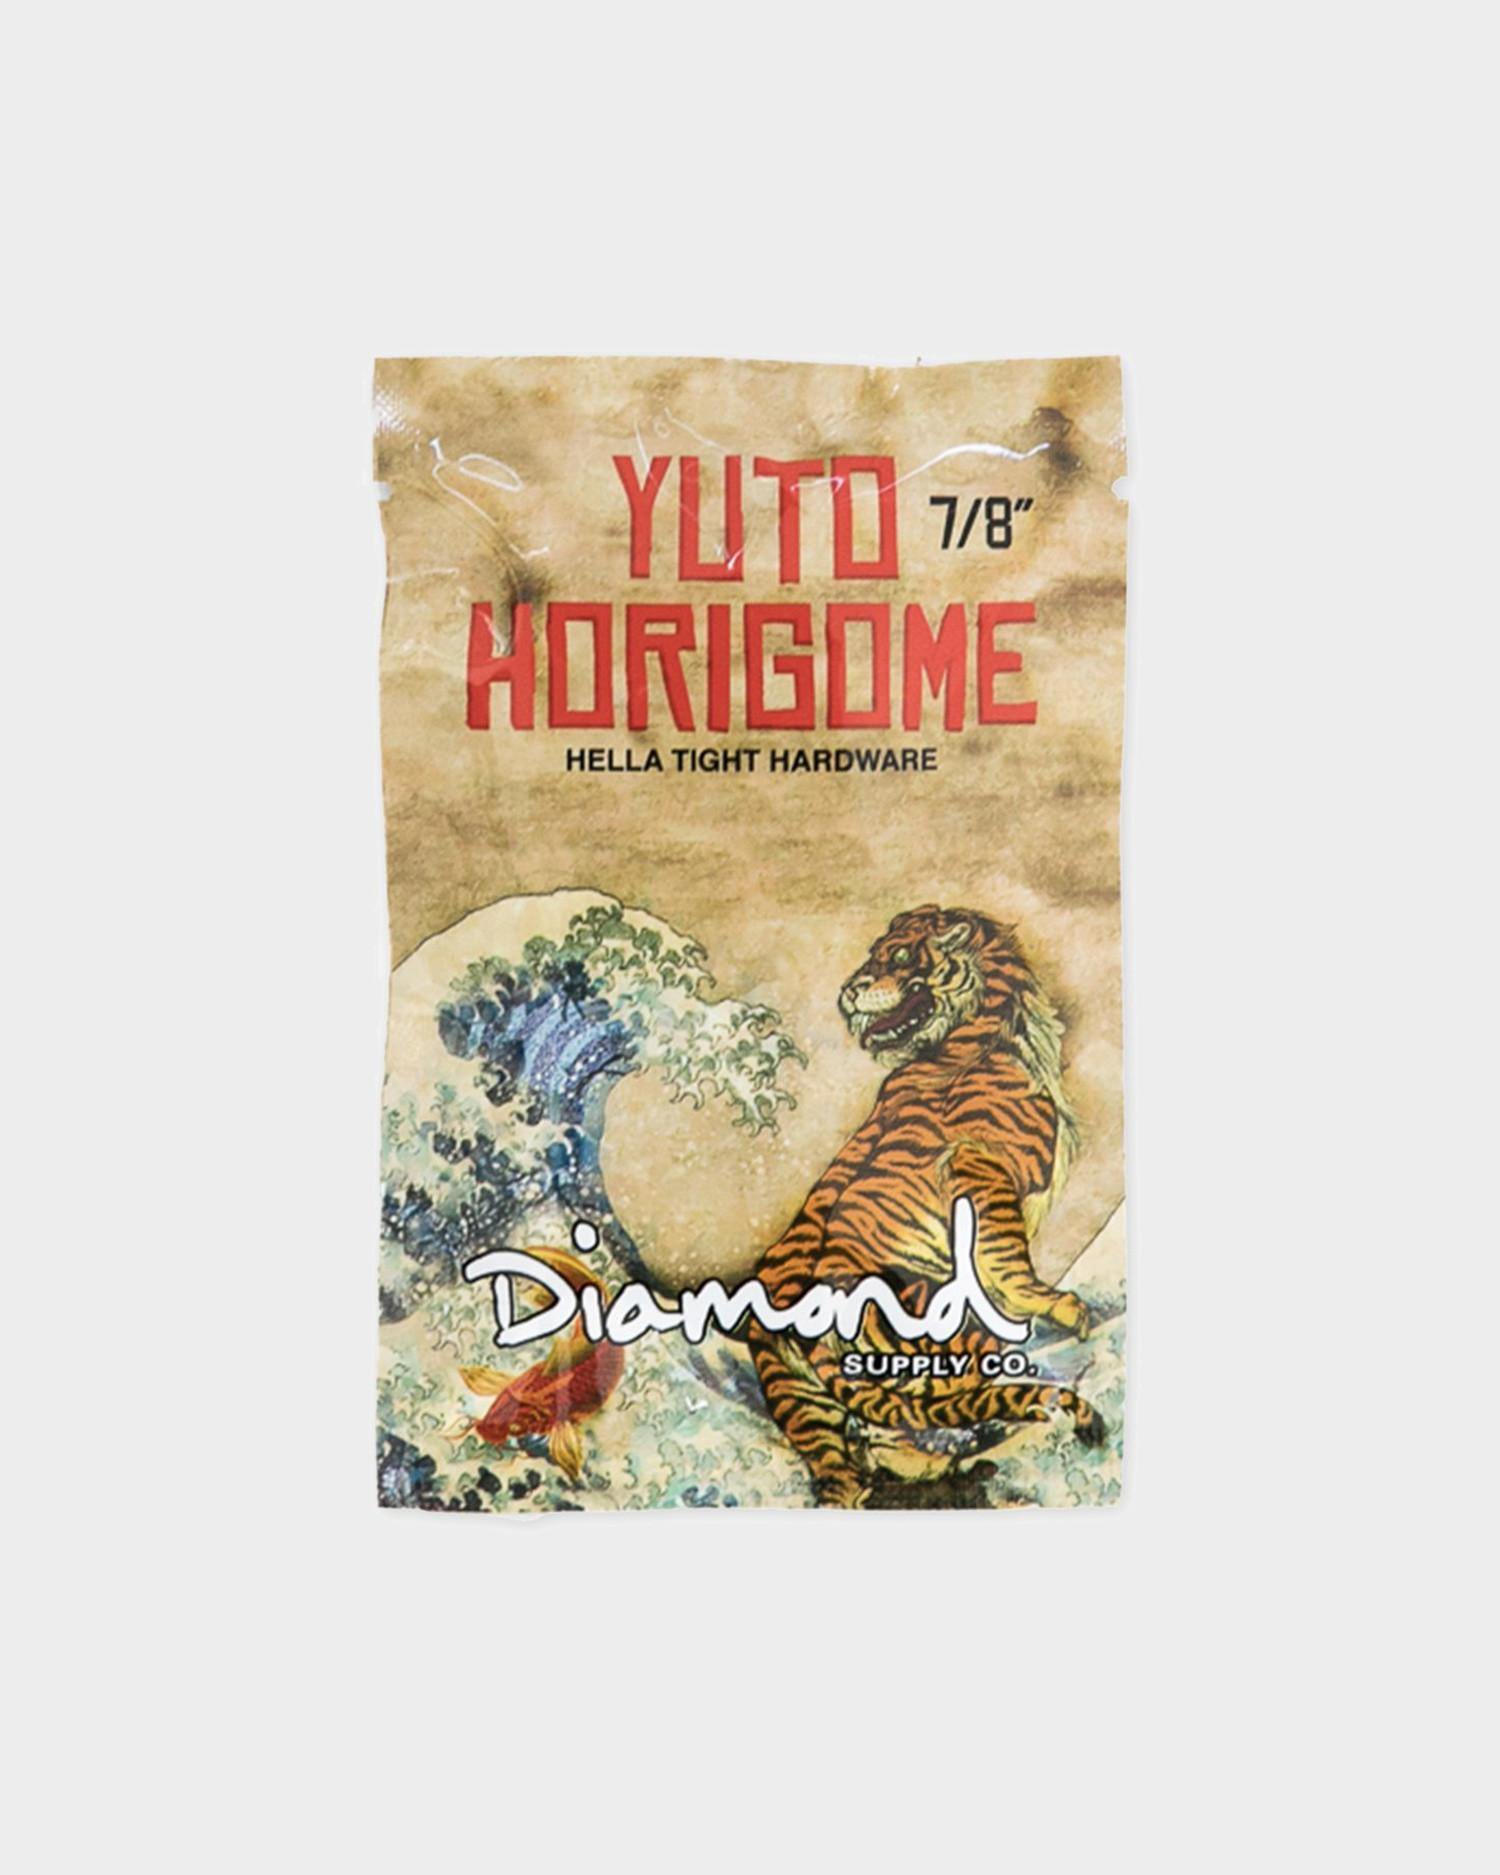 Diamond Bolts Yuto Horigome Pro Hardware 7/8 inch Gold